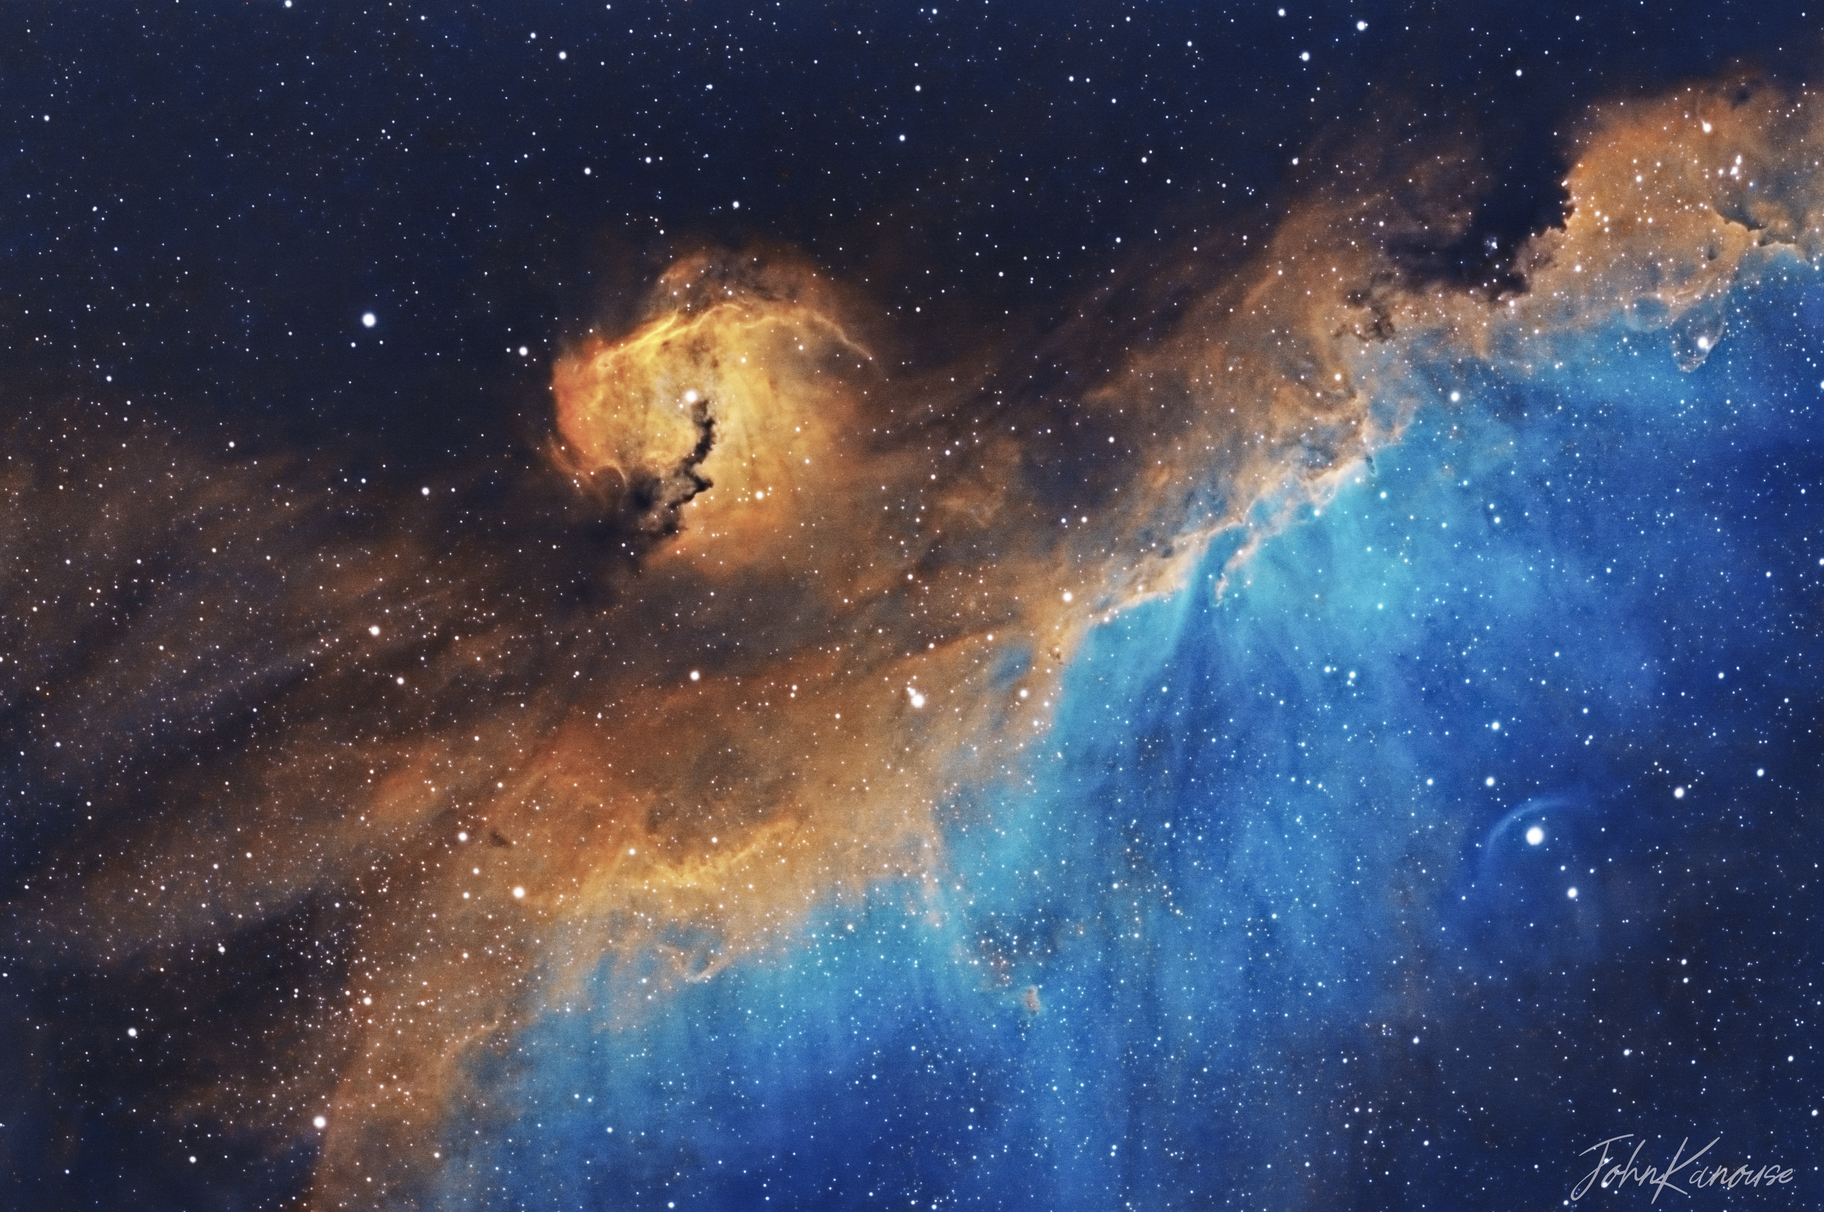 IC2177 The Seagull Nebula,                                John Kanouse